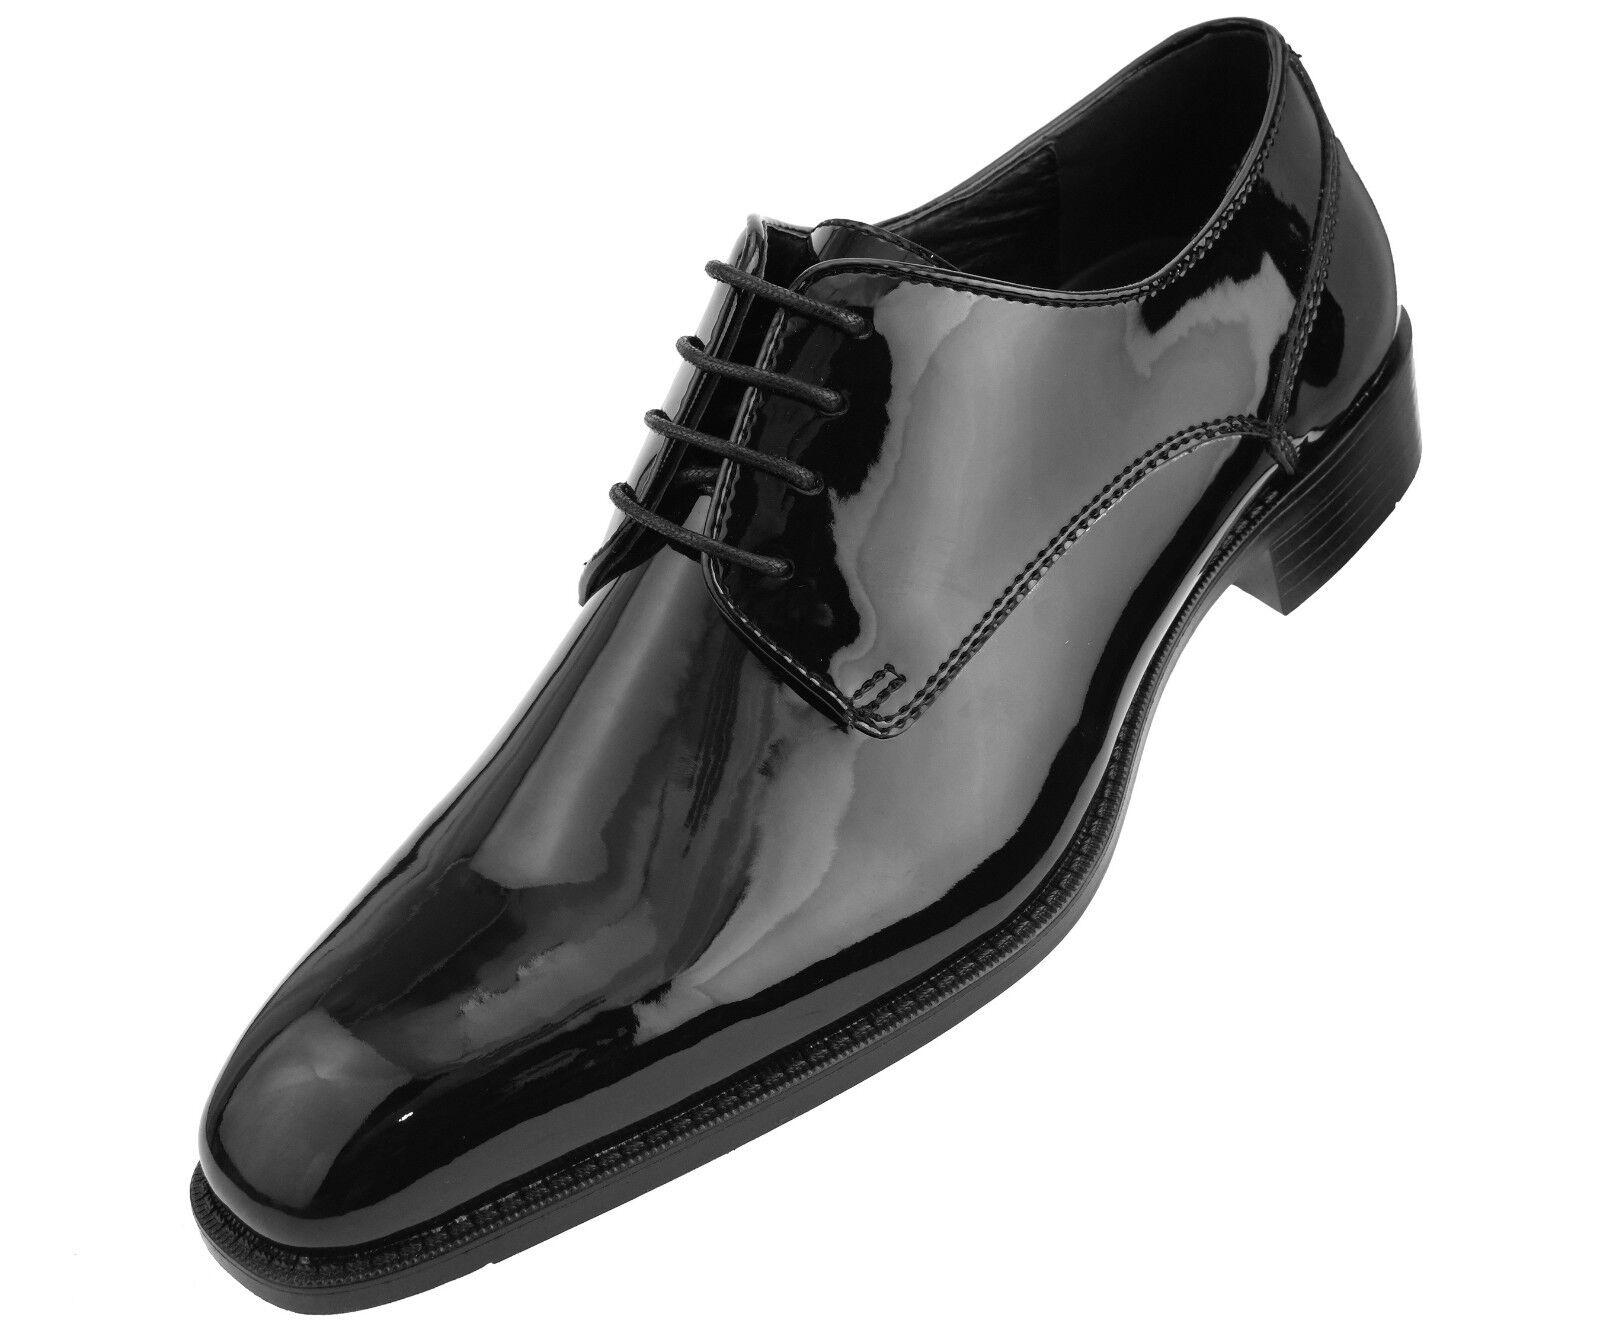 Fashion Shoebox Mens Patent Leather Tuxedo Dress Shoes Lace up Pointed Toe Oxfords